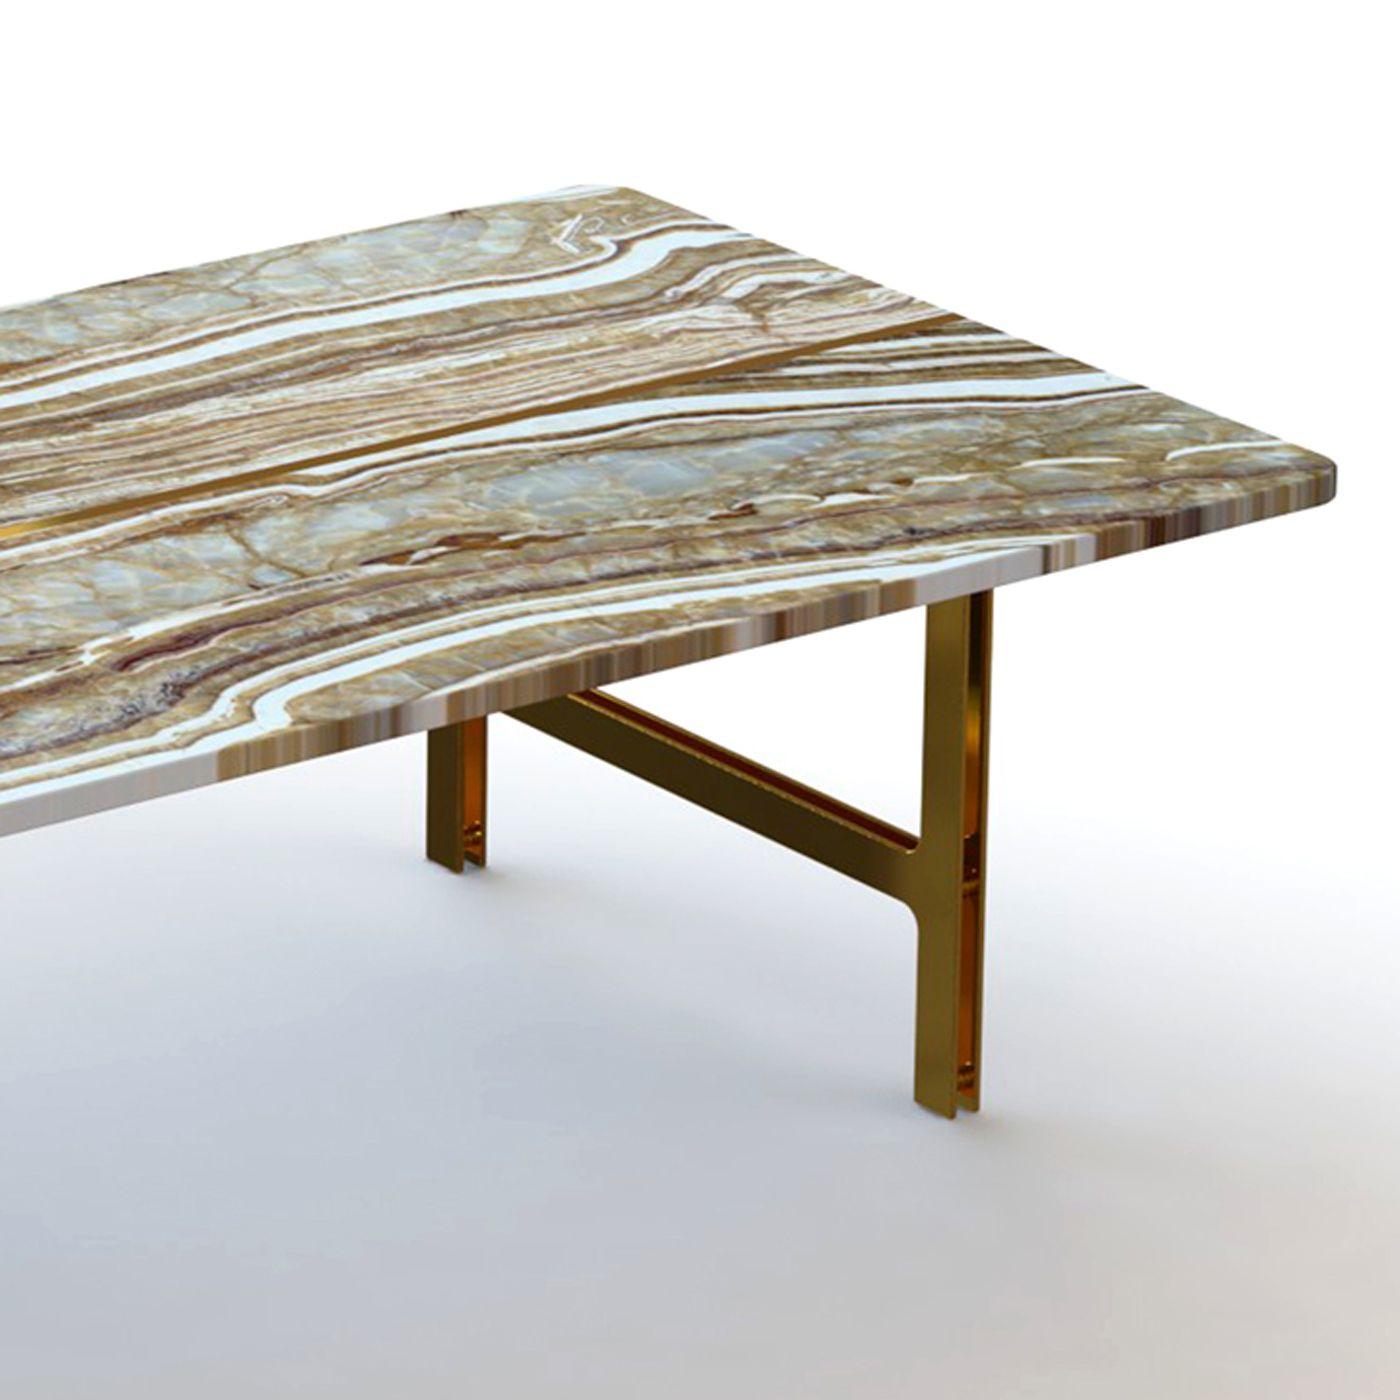 Split Coffee Table In Tiger Onyx Marble   Shop Francesco Meda Online At  Artemest